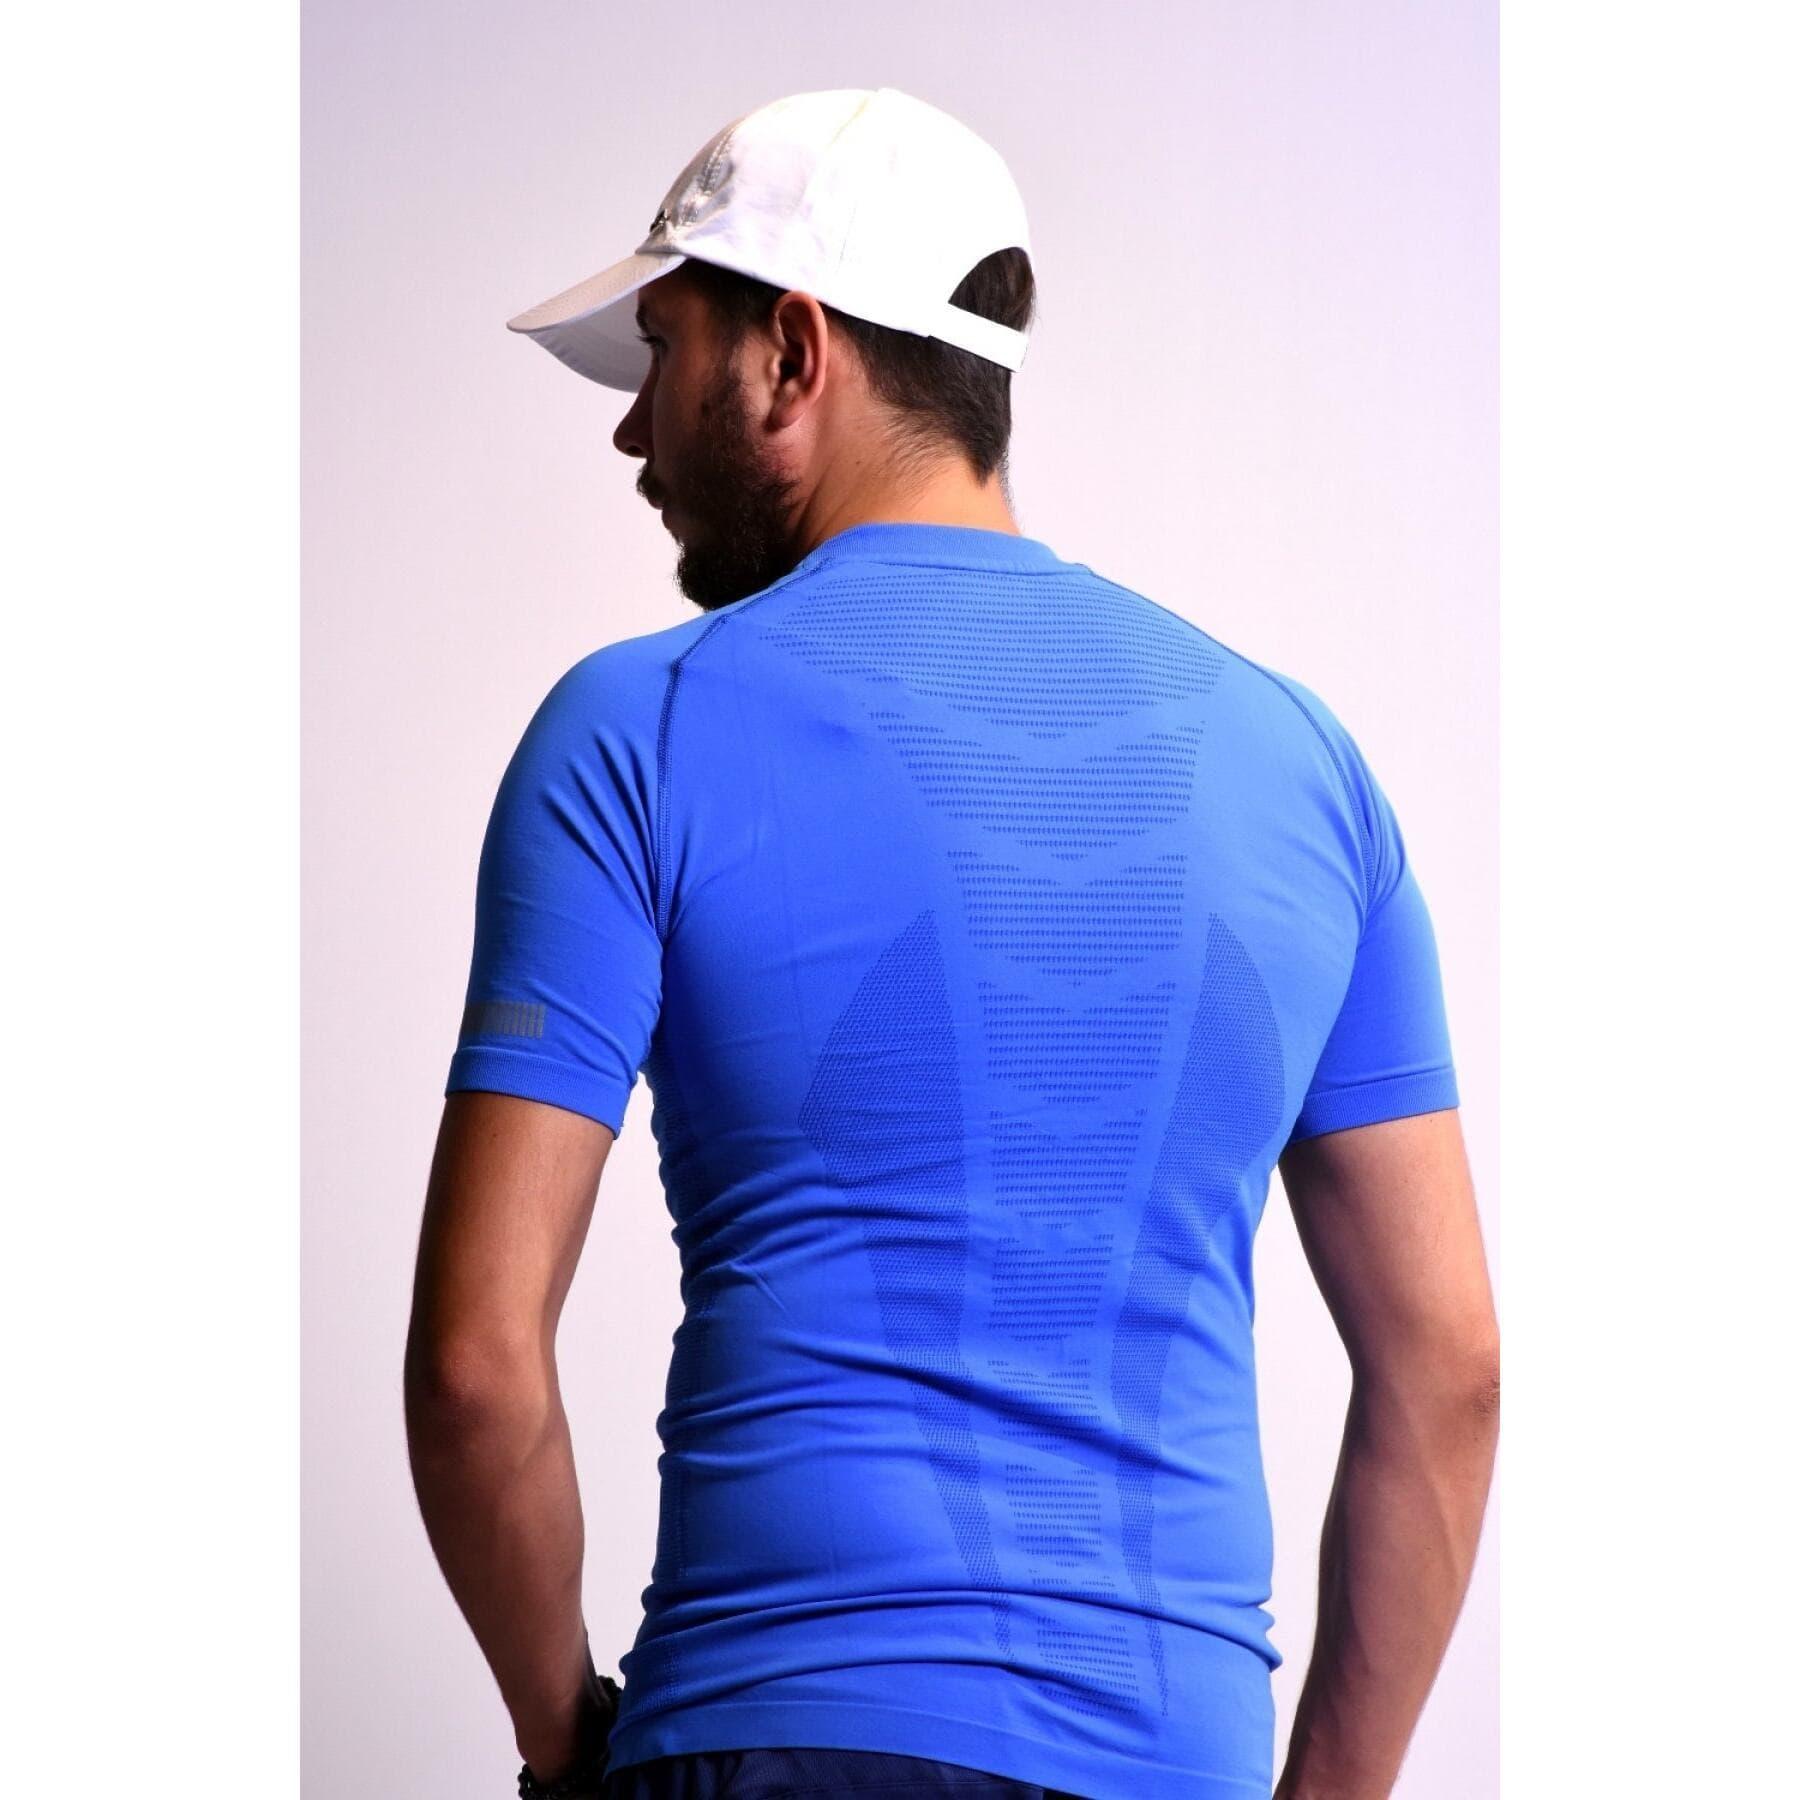 Boss Tee Sml Erkek Mavi Spor Tişört (R2364)